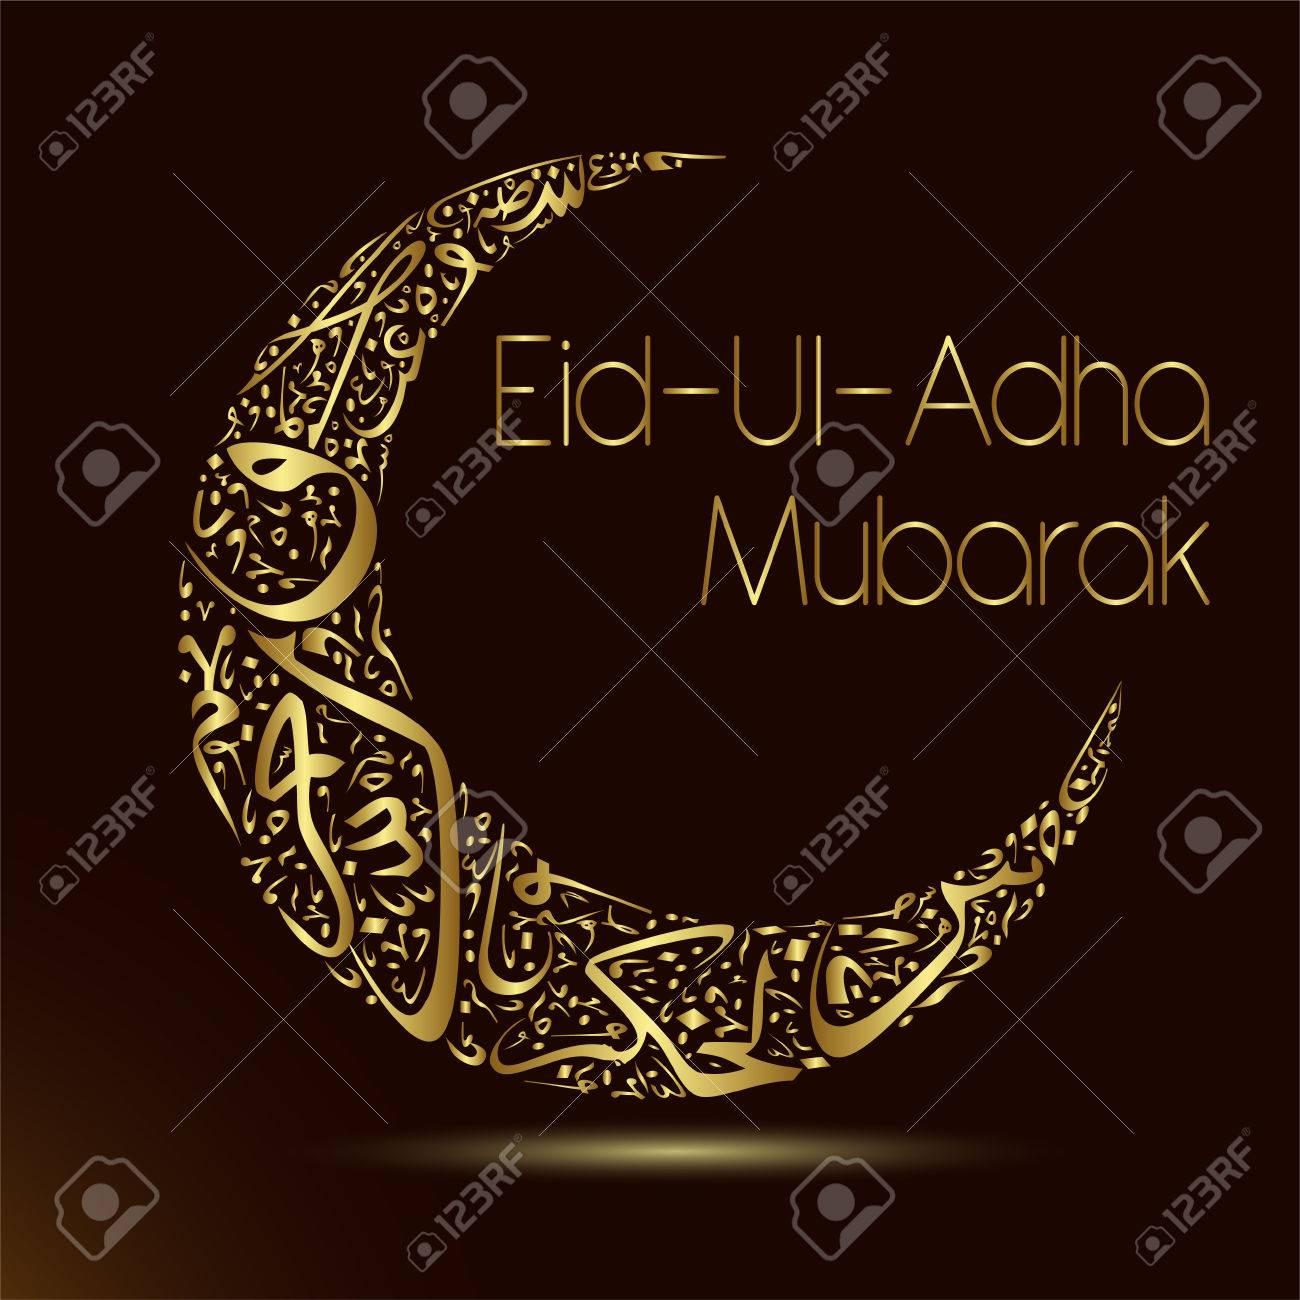 Eid Ul Adha Mubarak Royalty Free Cliparts Vectors And Stock Illustration Image 34910358